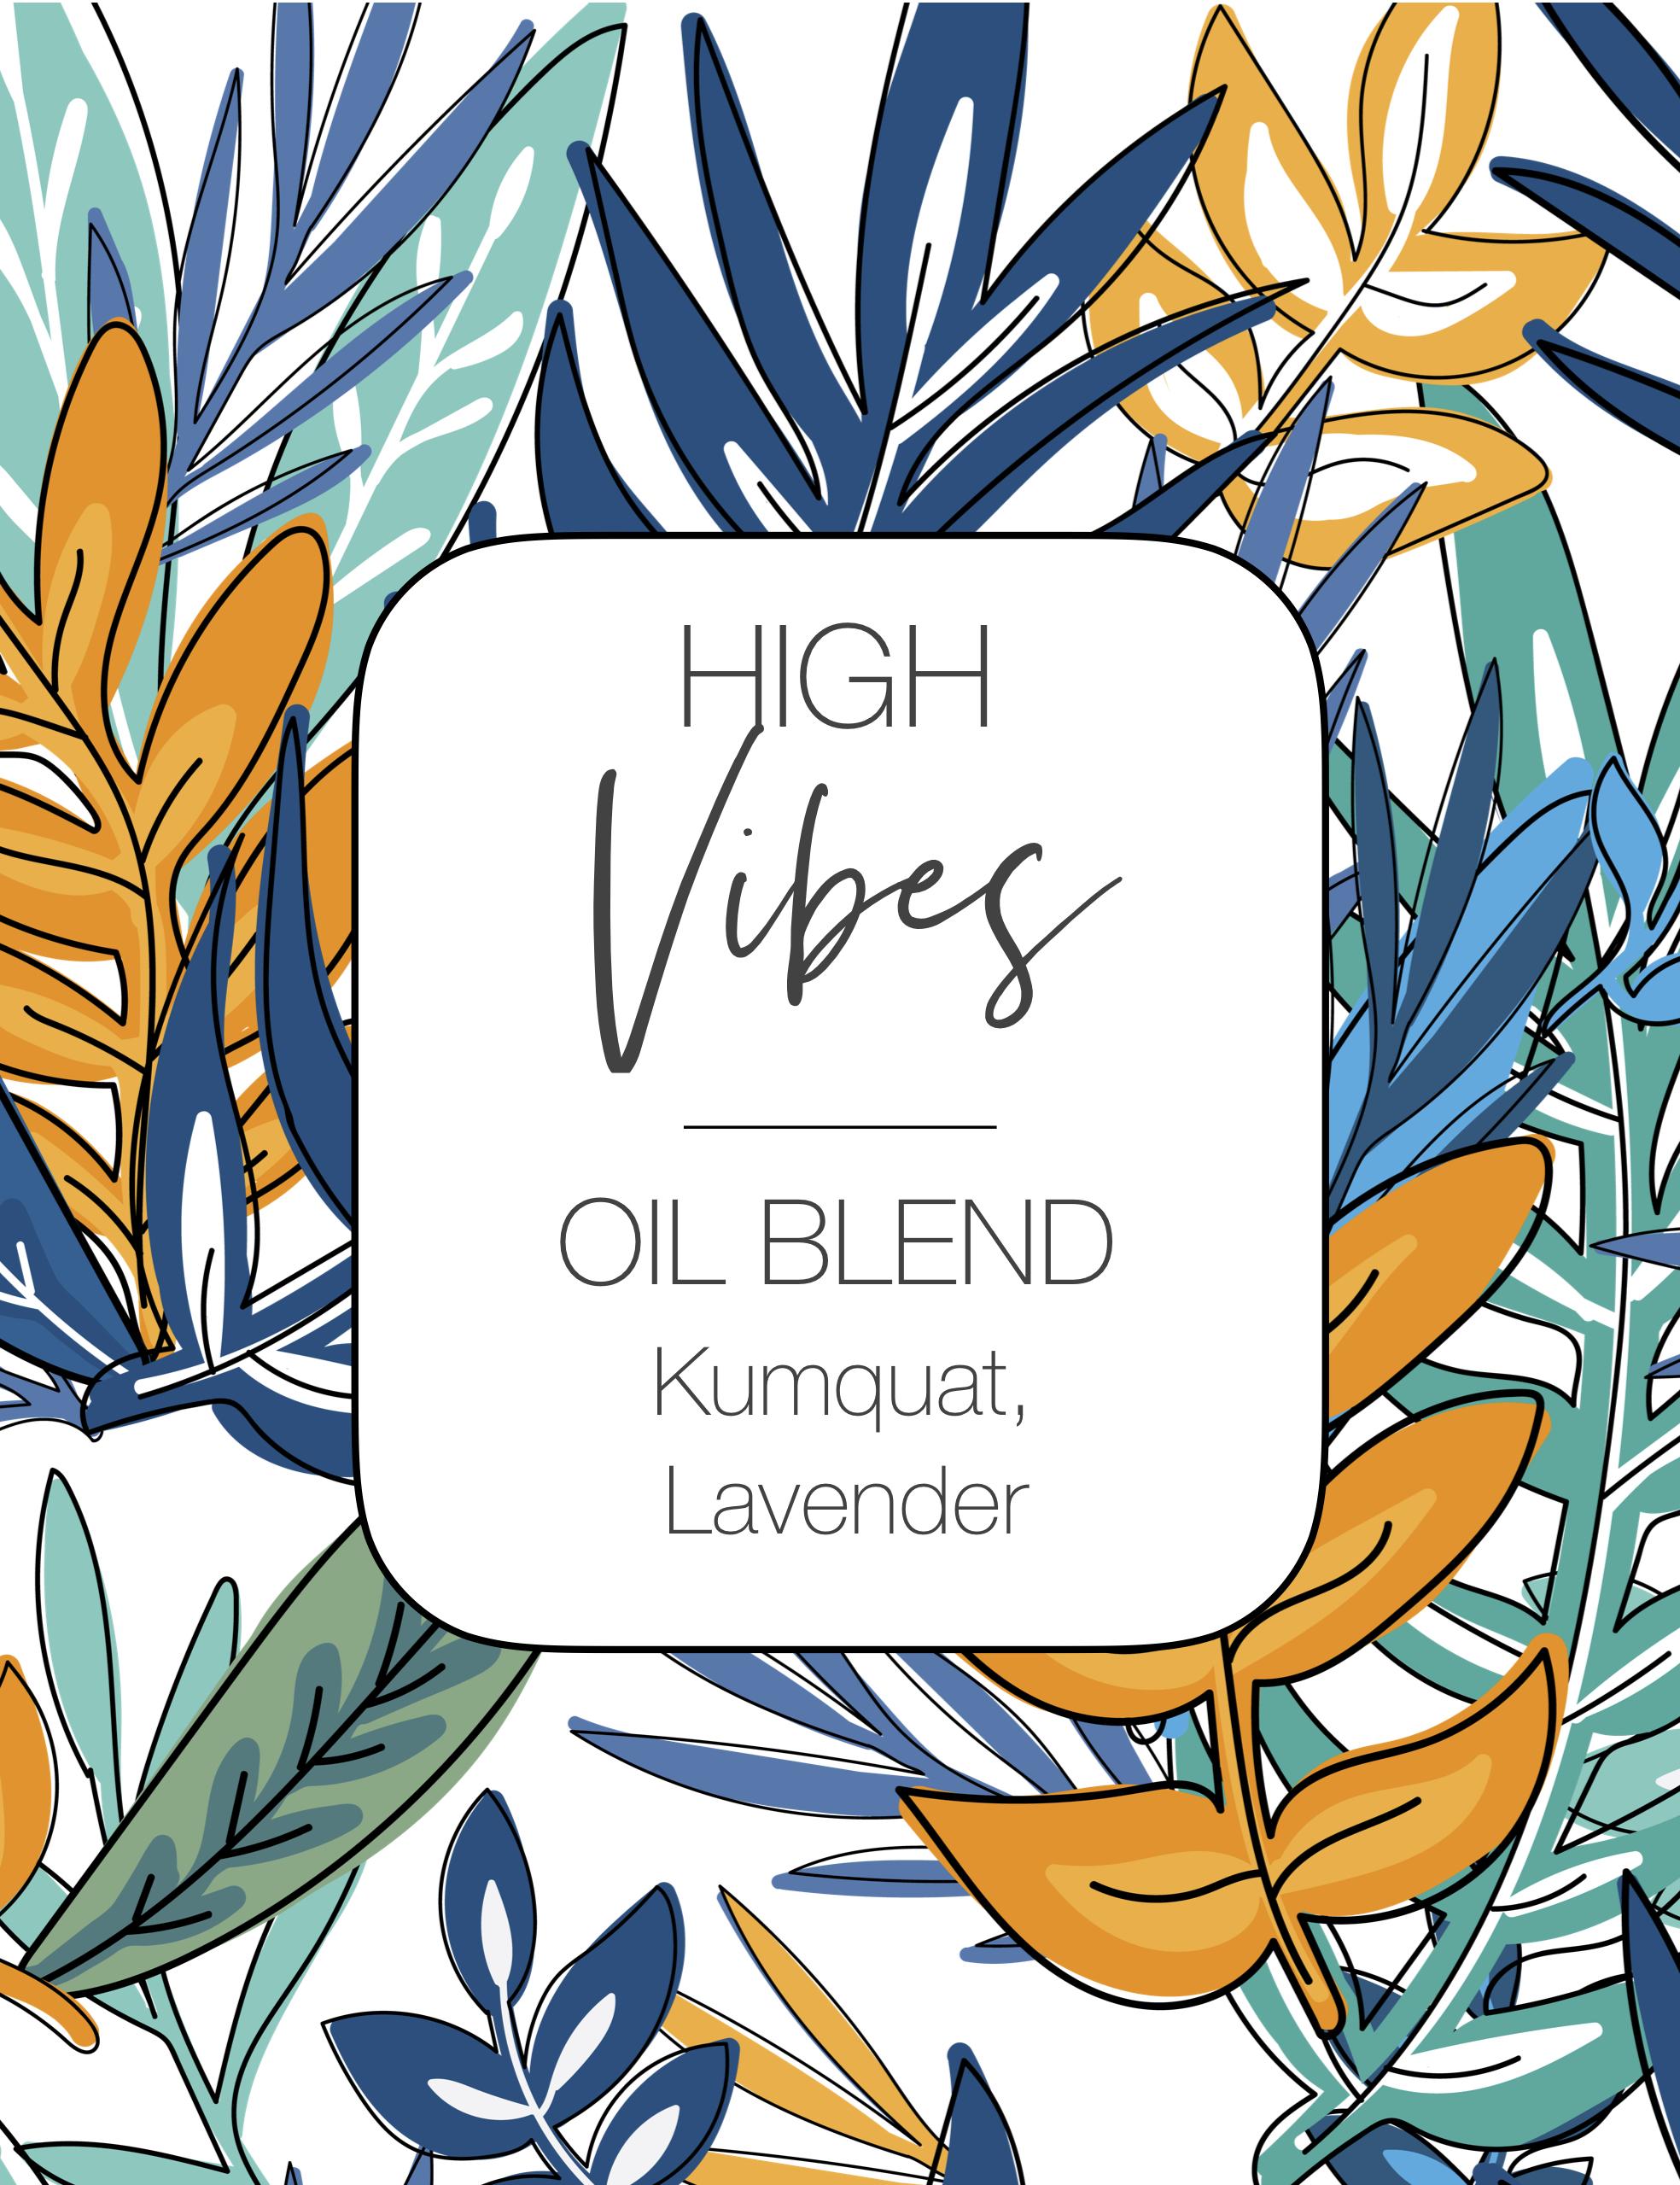 High-Vibes-10ml-Roller-Bottle-Blend-JPEG.jpg